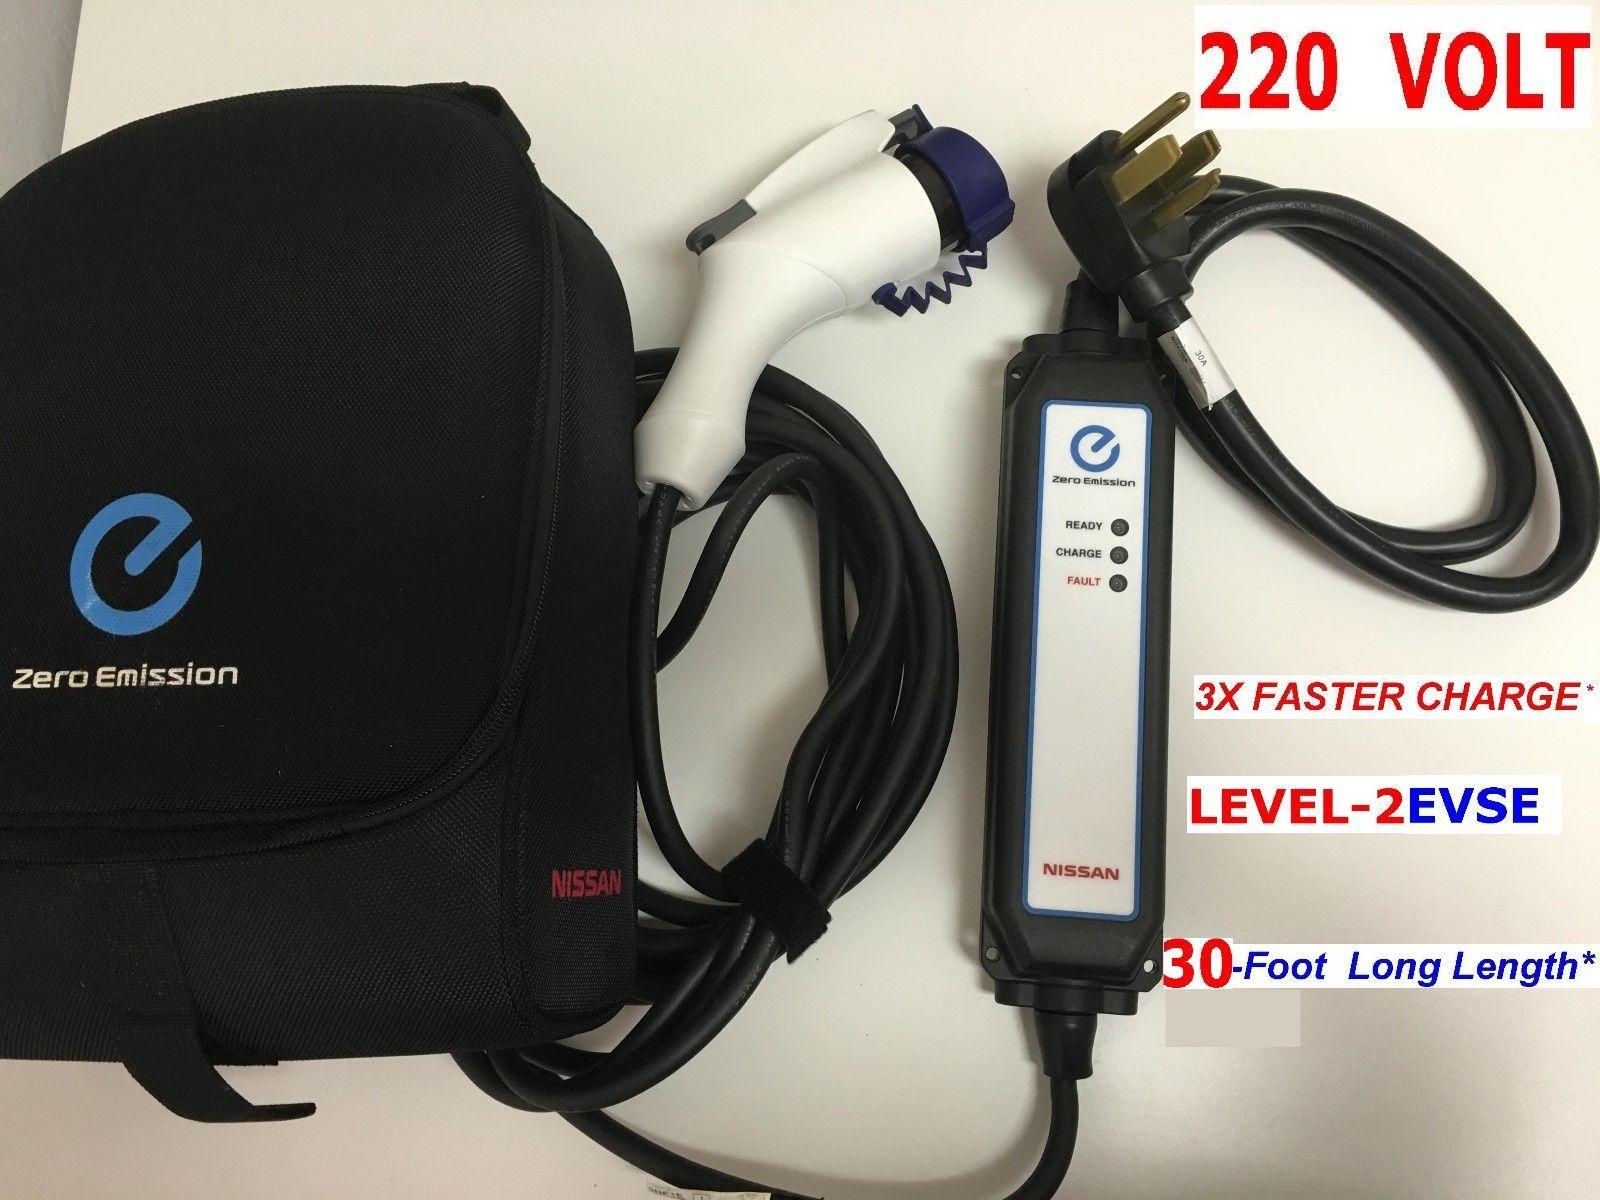 3xfaster charge level2 evse upgraded 220 240 volt nissan